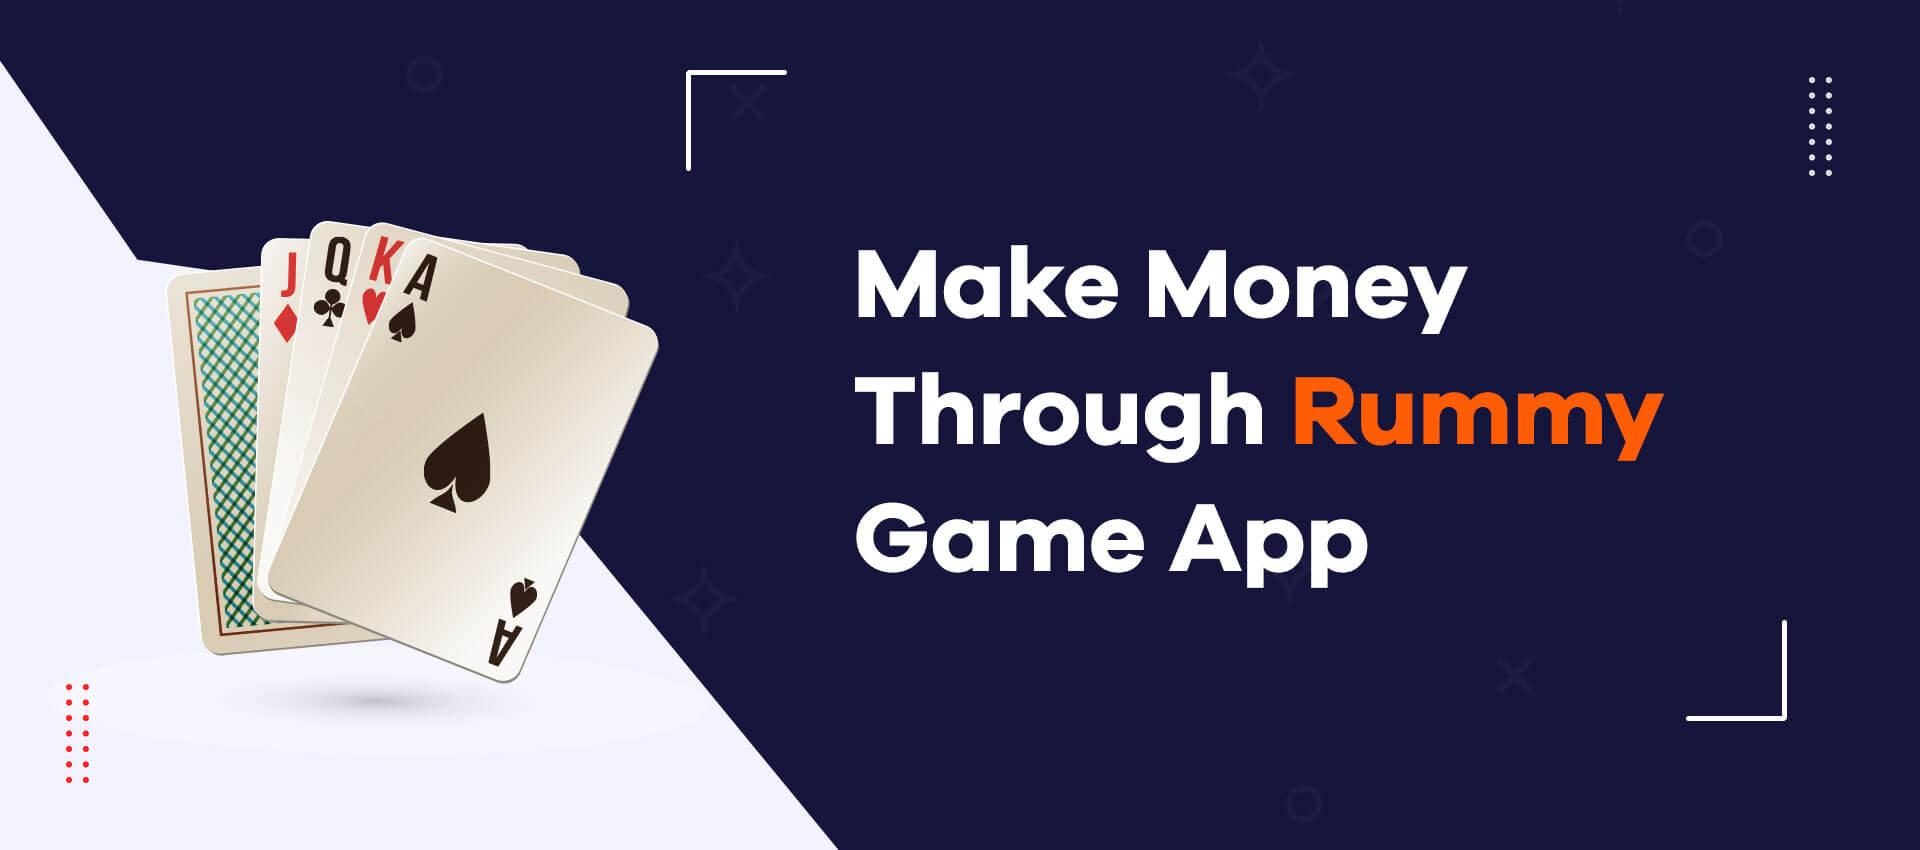 How to earn money online rummy